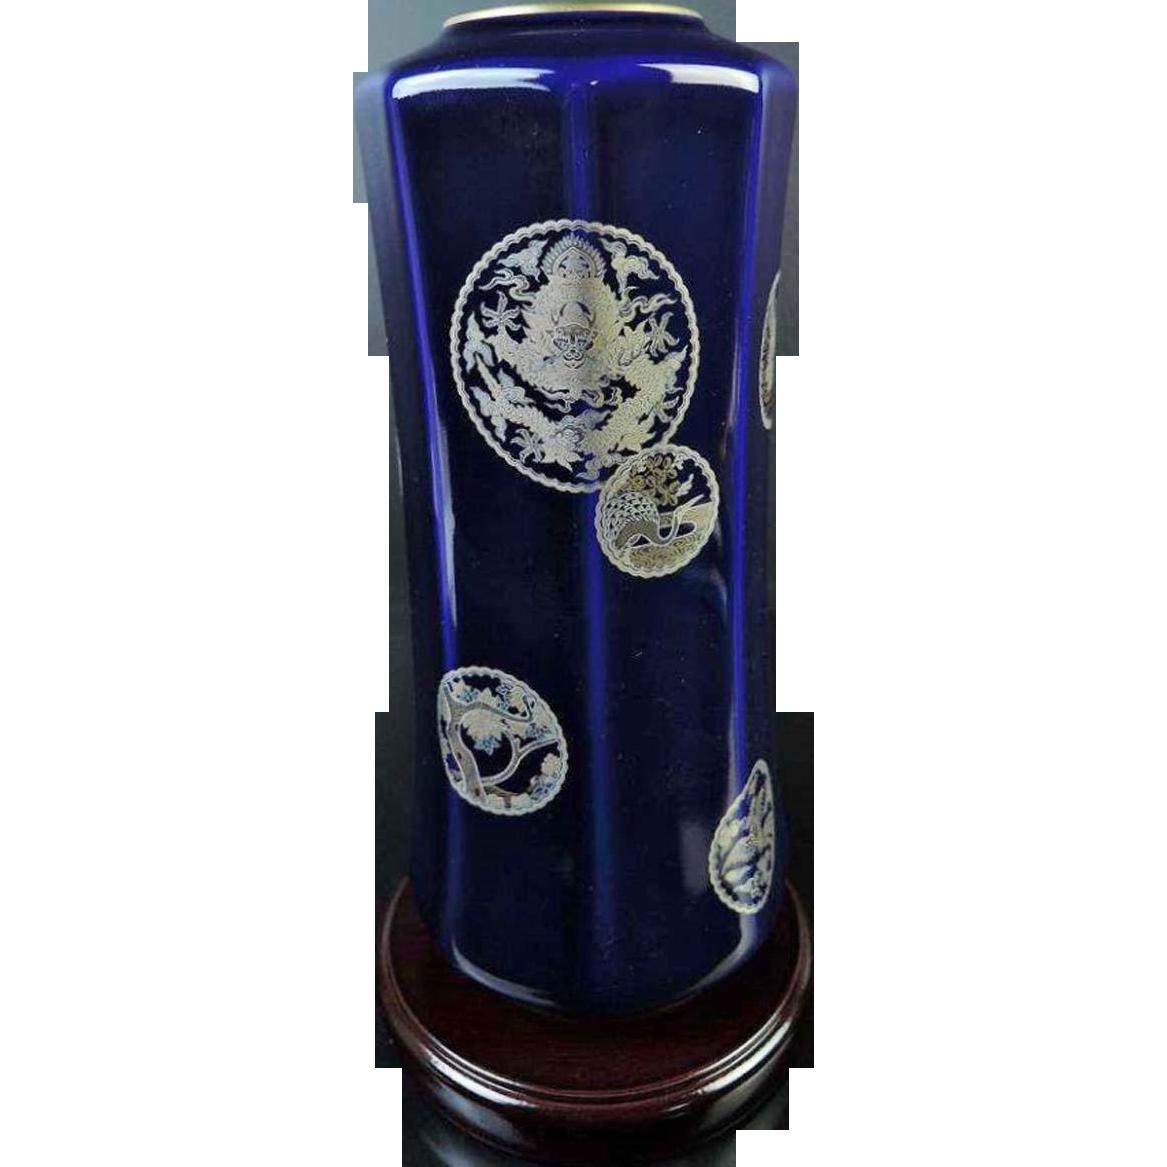 Signed Vintage Koransha 香蘭社 Octaganol Porcelain Vase of Lapus Lazuli Glaze